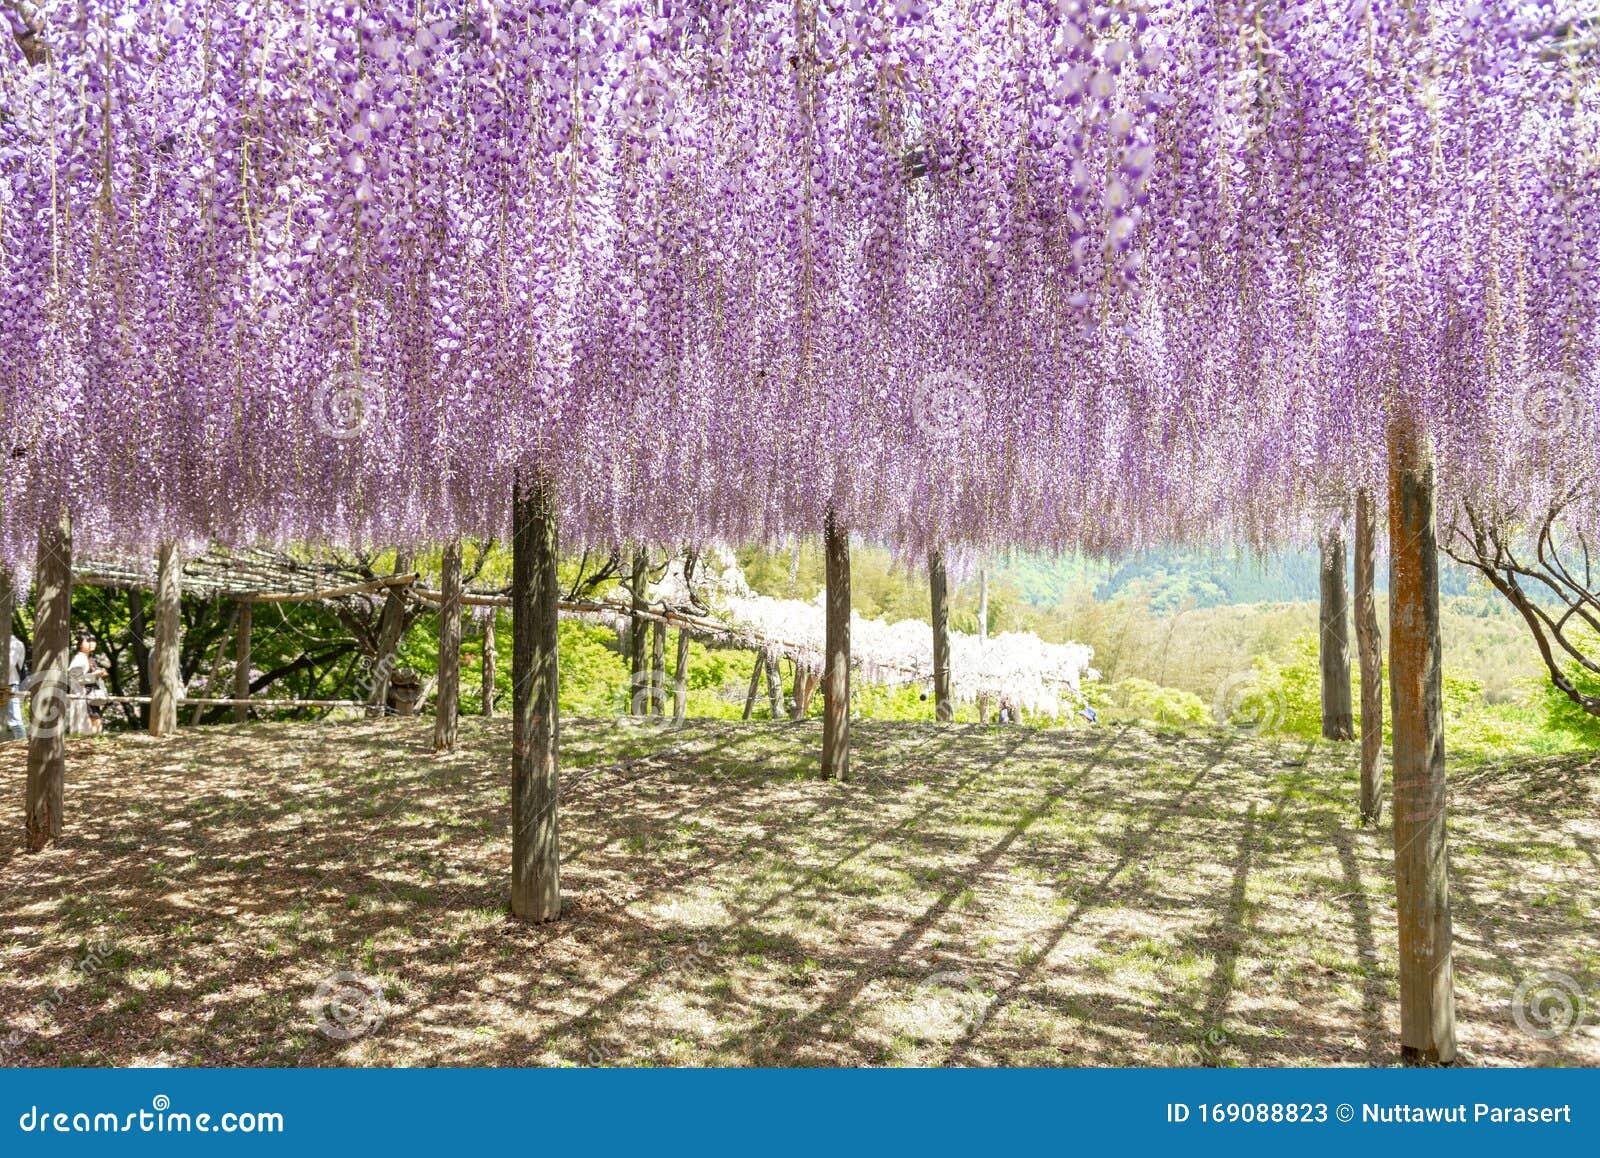 Close Up Of Beautiful Wisteria Flower Tree At Kawachi Fuji Garden Fukuoka Japan Stock Image Image Of Seasonal Blossom 169088823